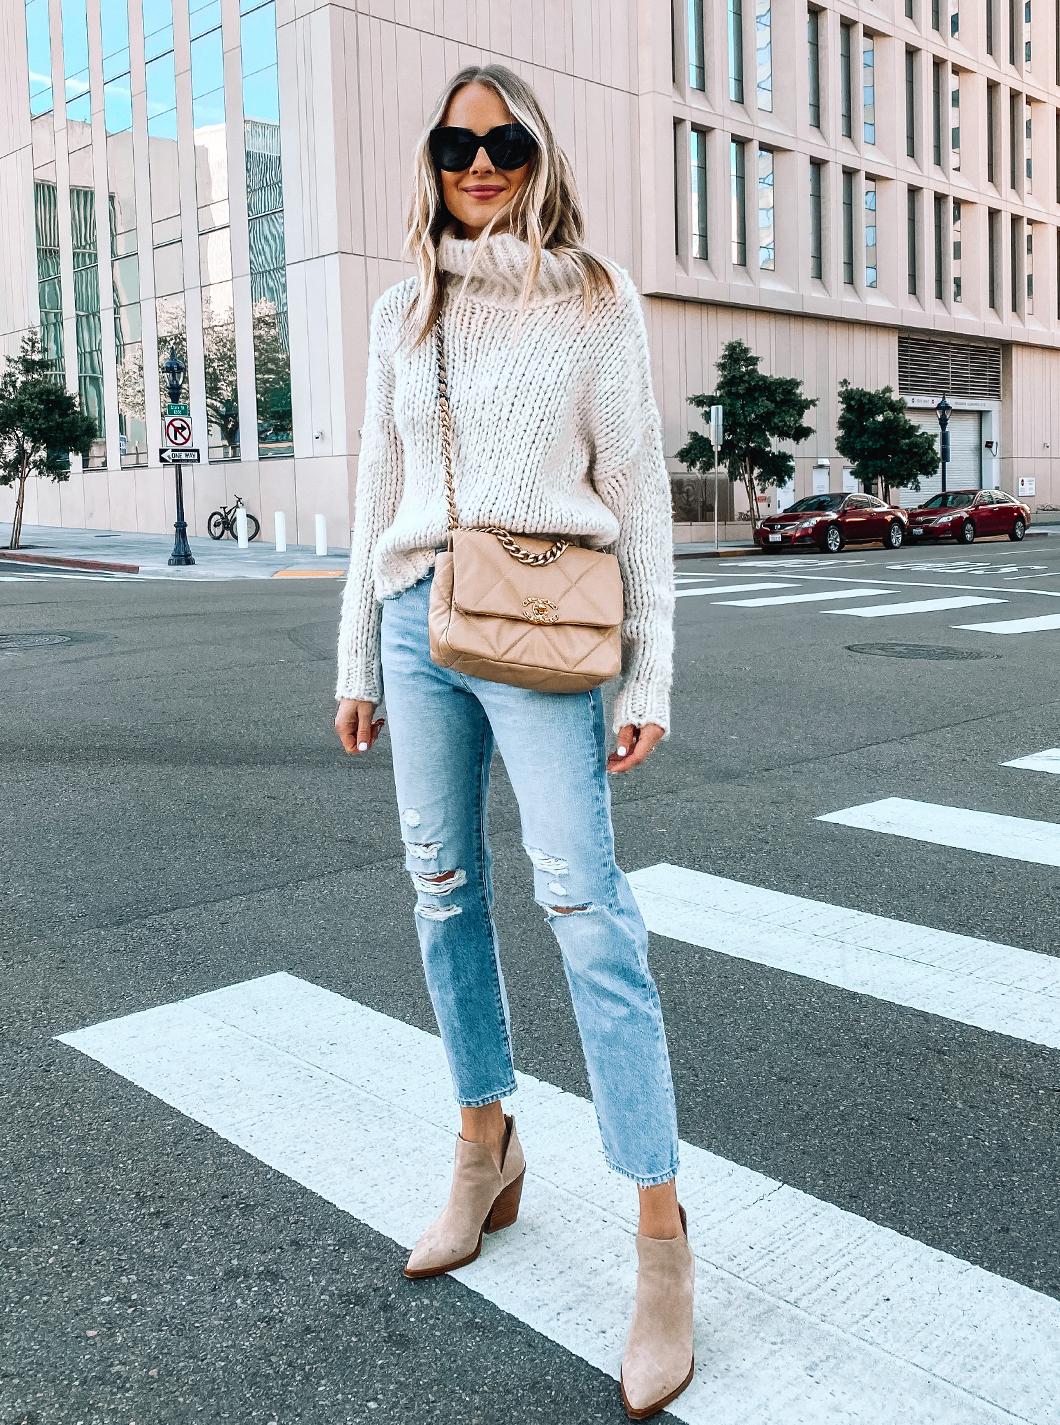 Fashion Jackson Wearing Topshop Chunky Sweater Frame Ripped Jeans Tan Suede Booties Chanel 19 Dark Beige Handbag